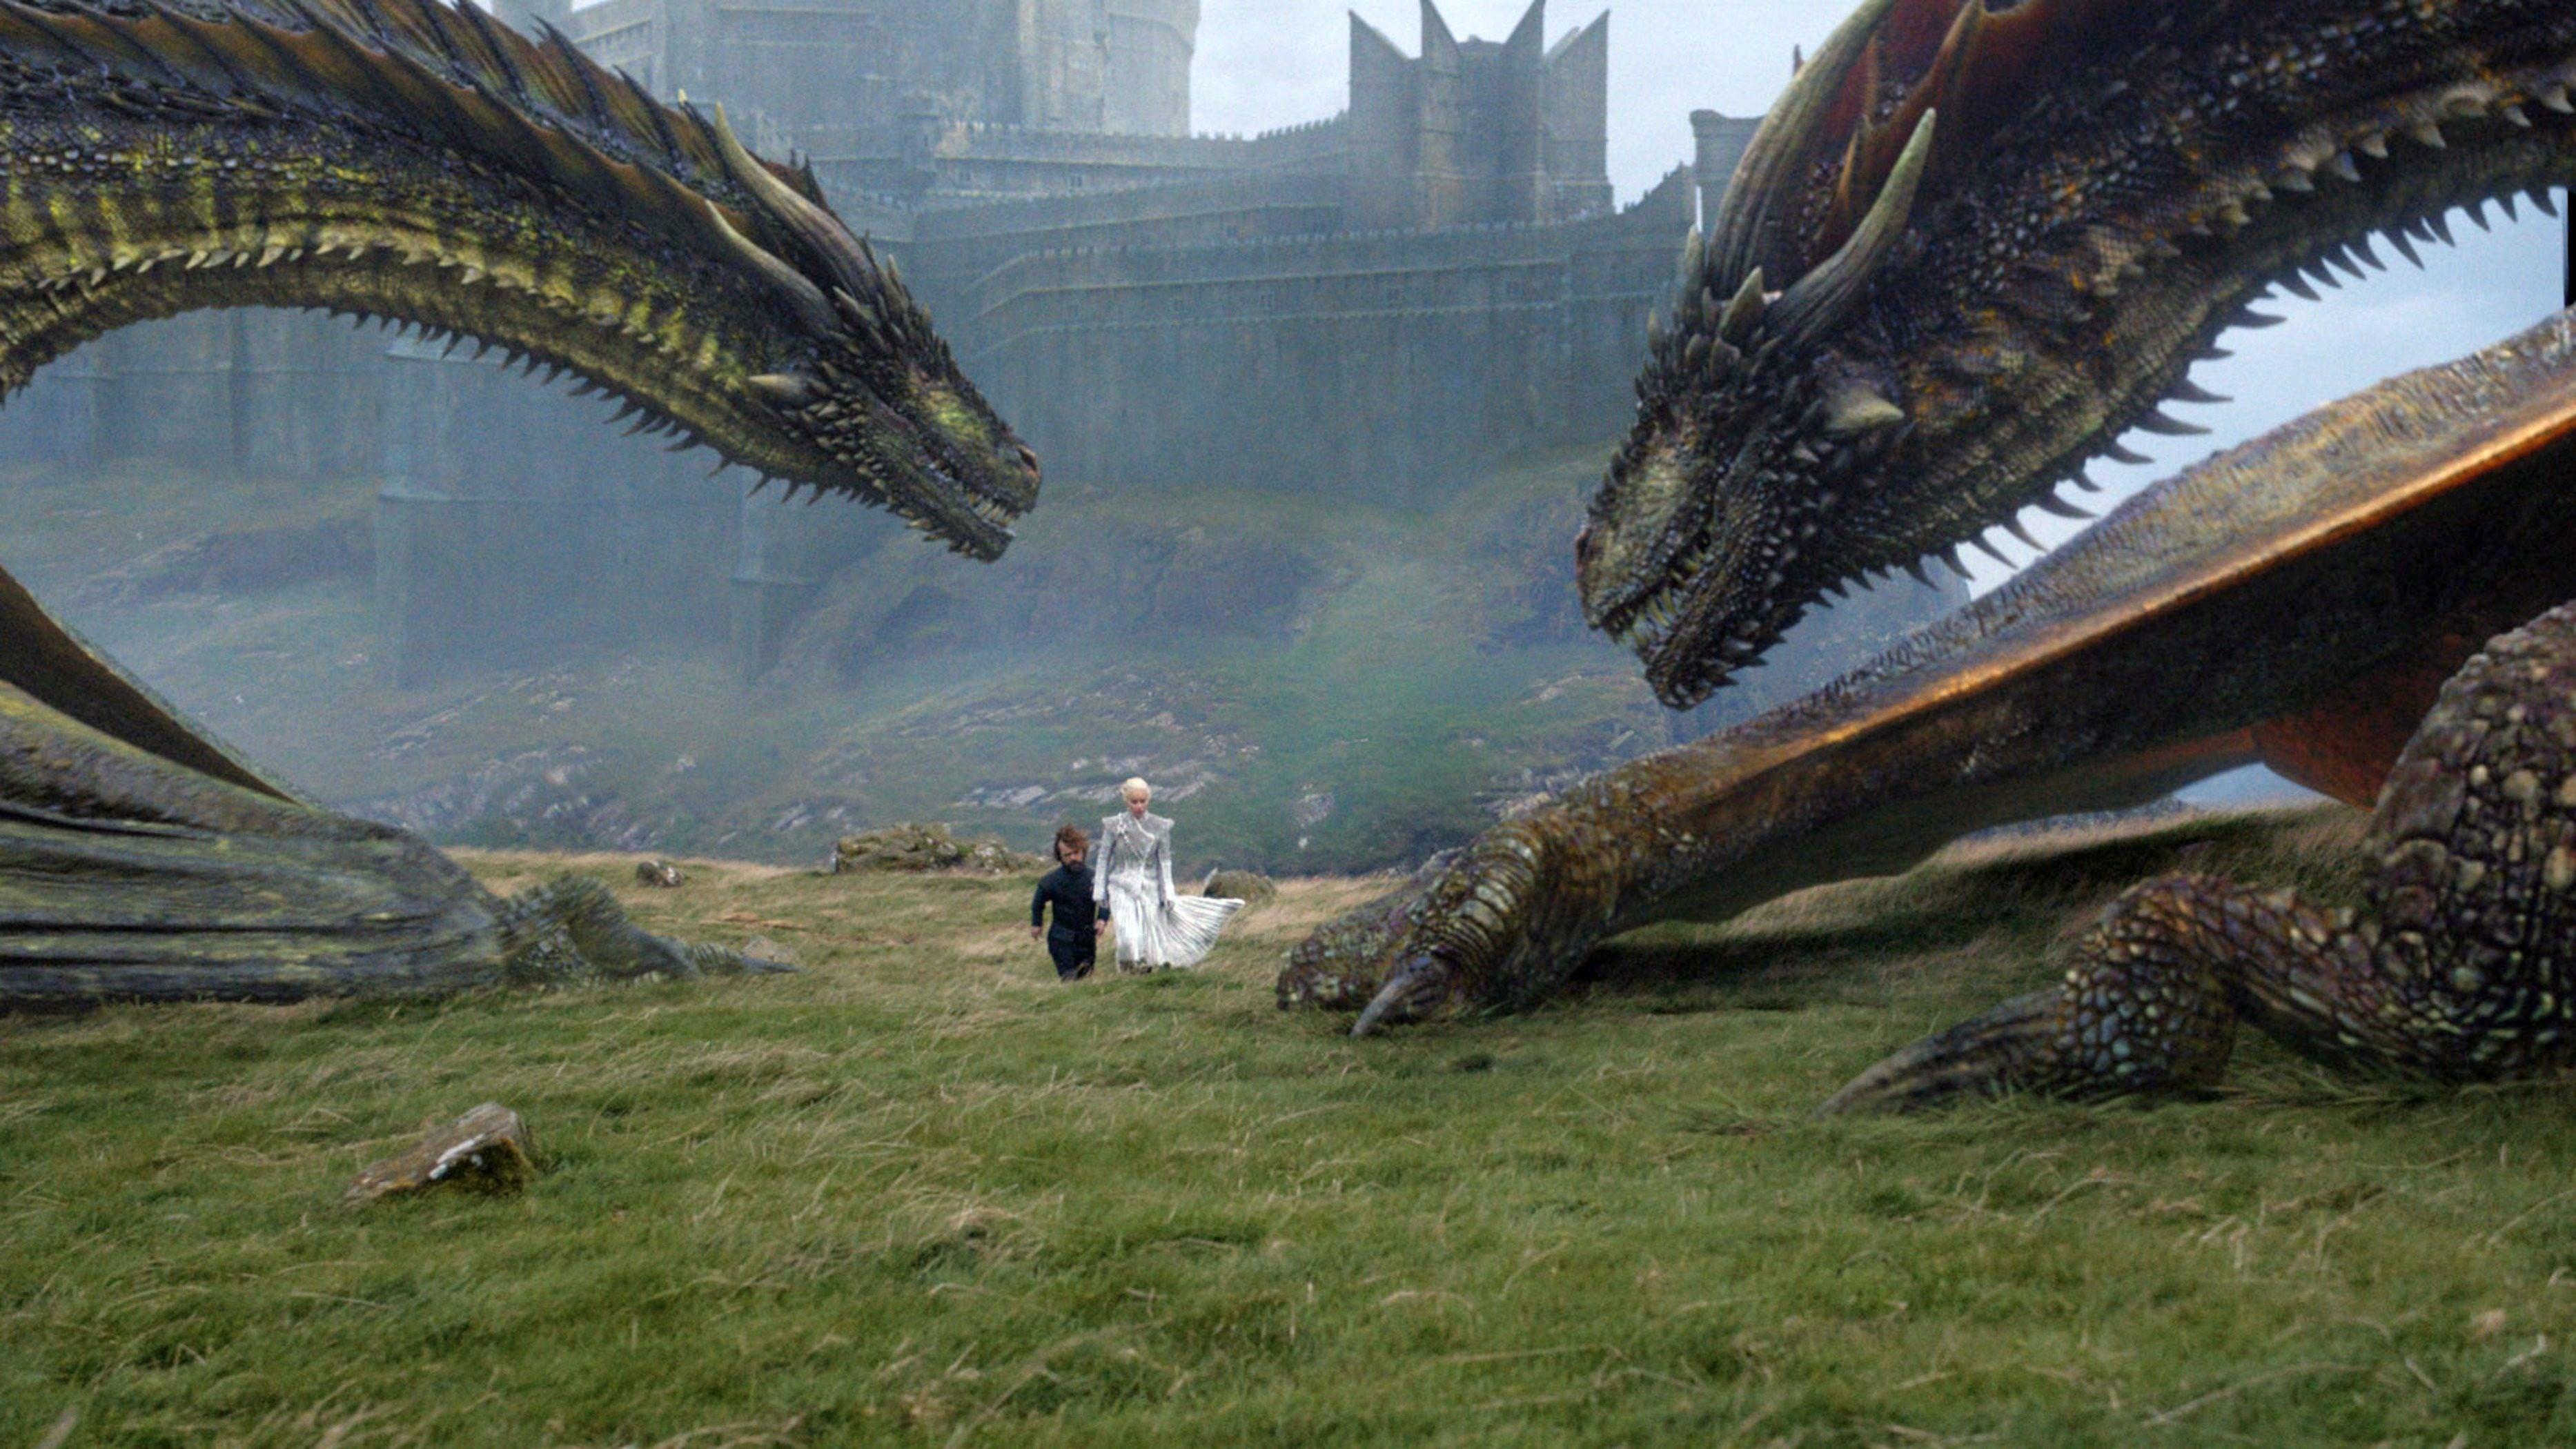 yify game of thrones season 7 episode 6